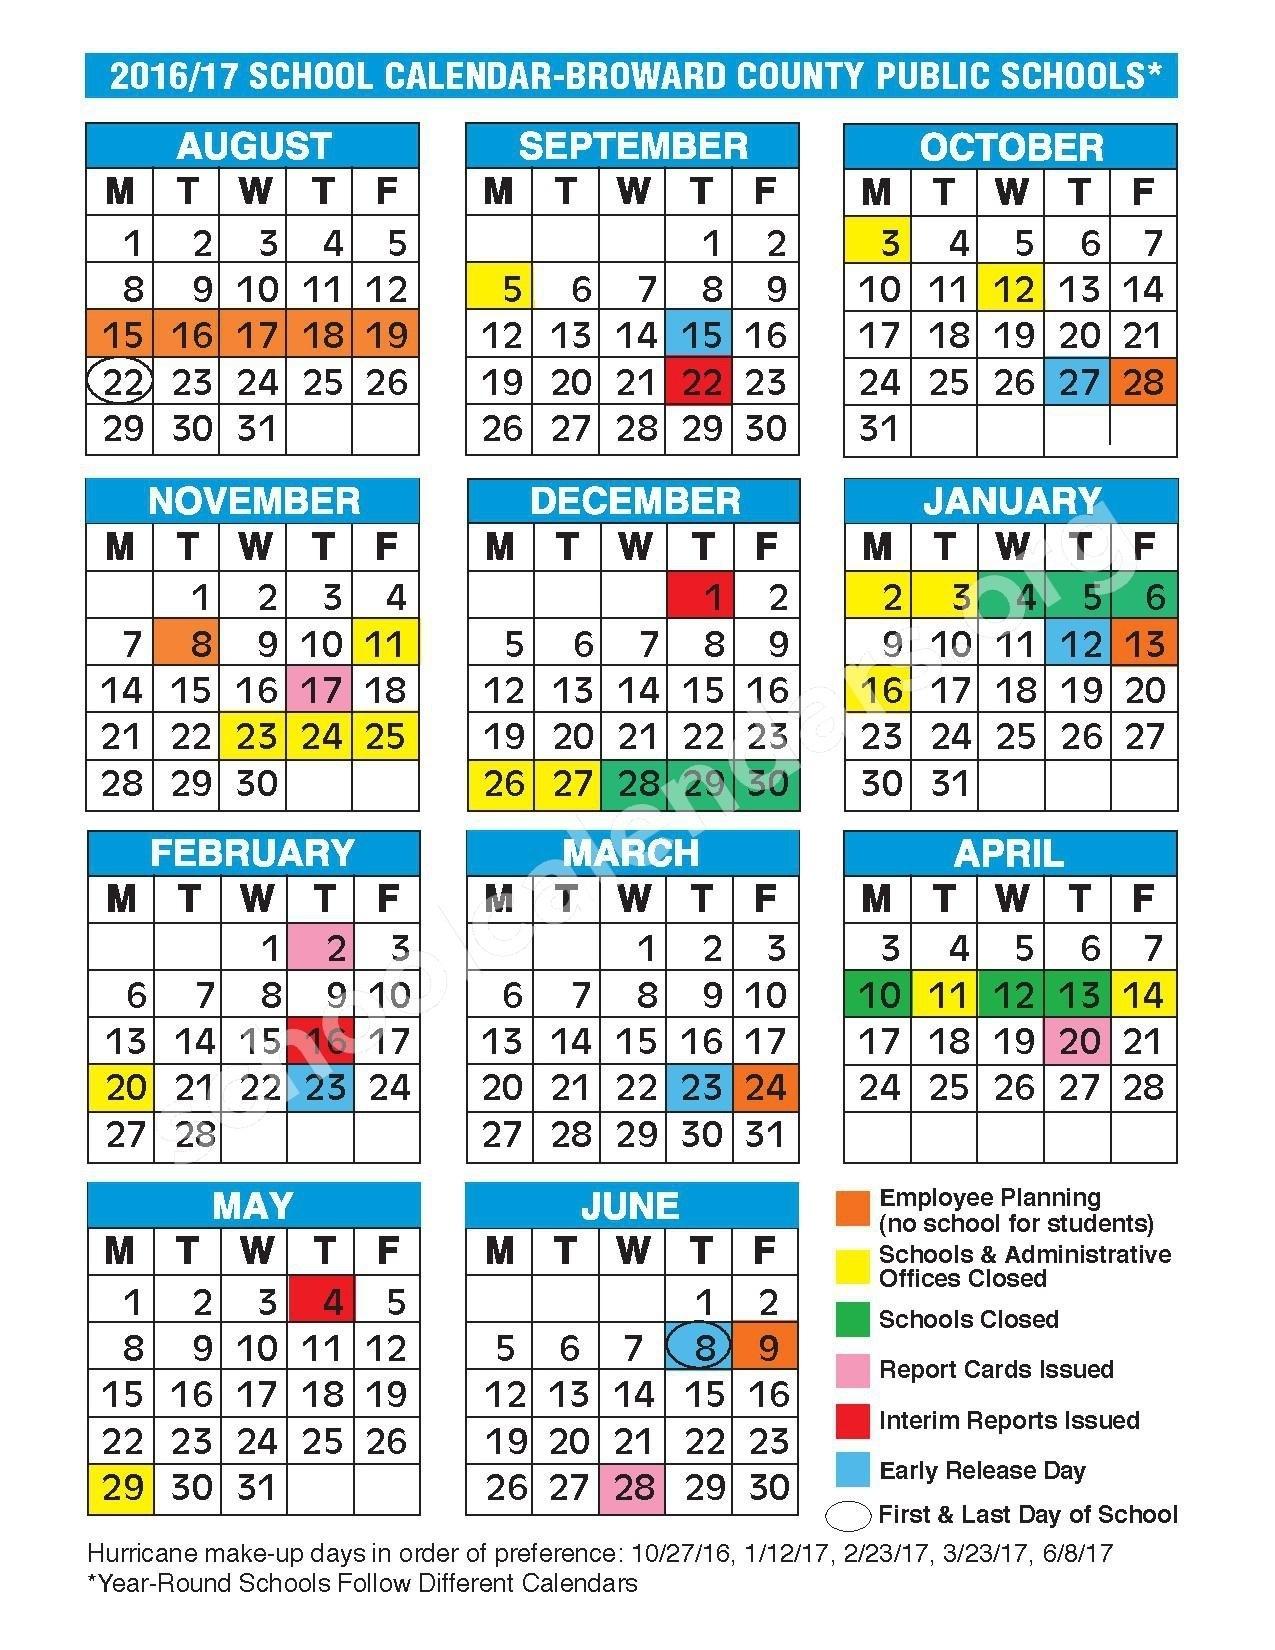 Broward School Calendar - Bgadv_School Calendar For Broward County